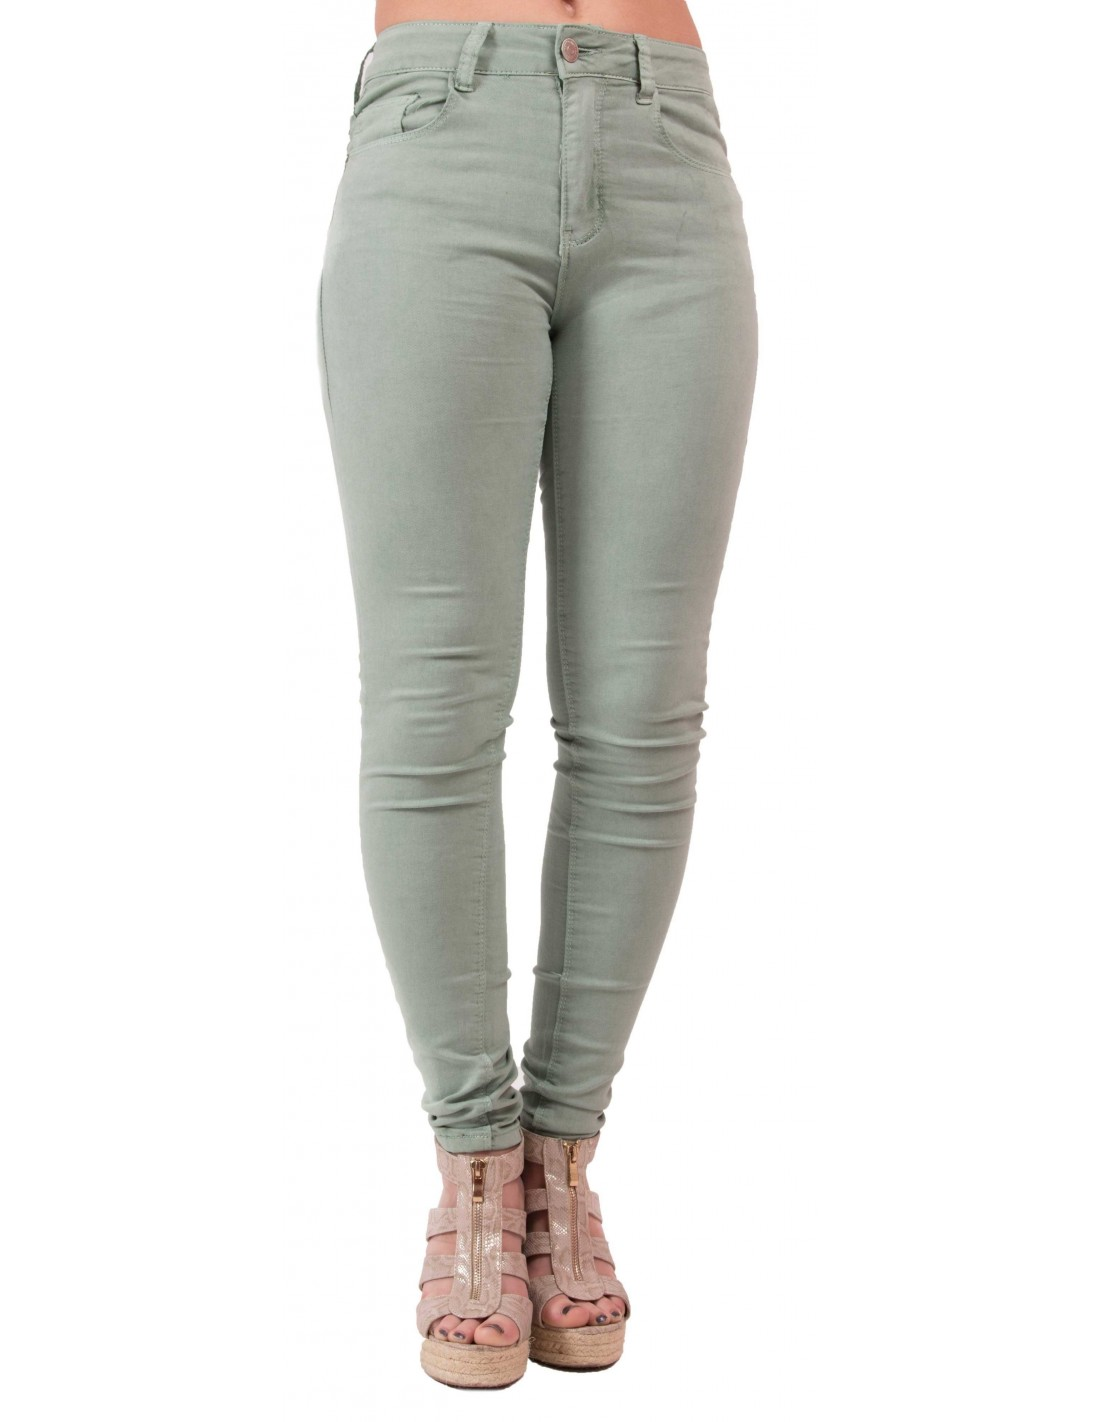 jean skinny vert clair femme taille haute type jean skinny stretch olive. Black Bedroom Furniture Sets. Home Design Ideas